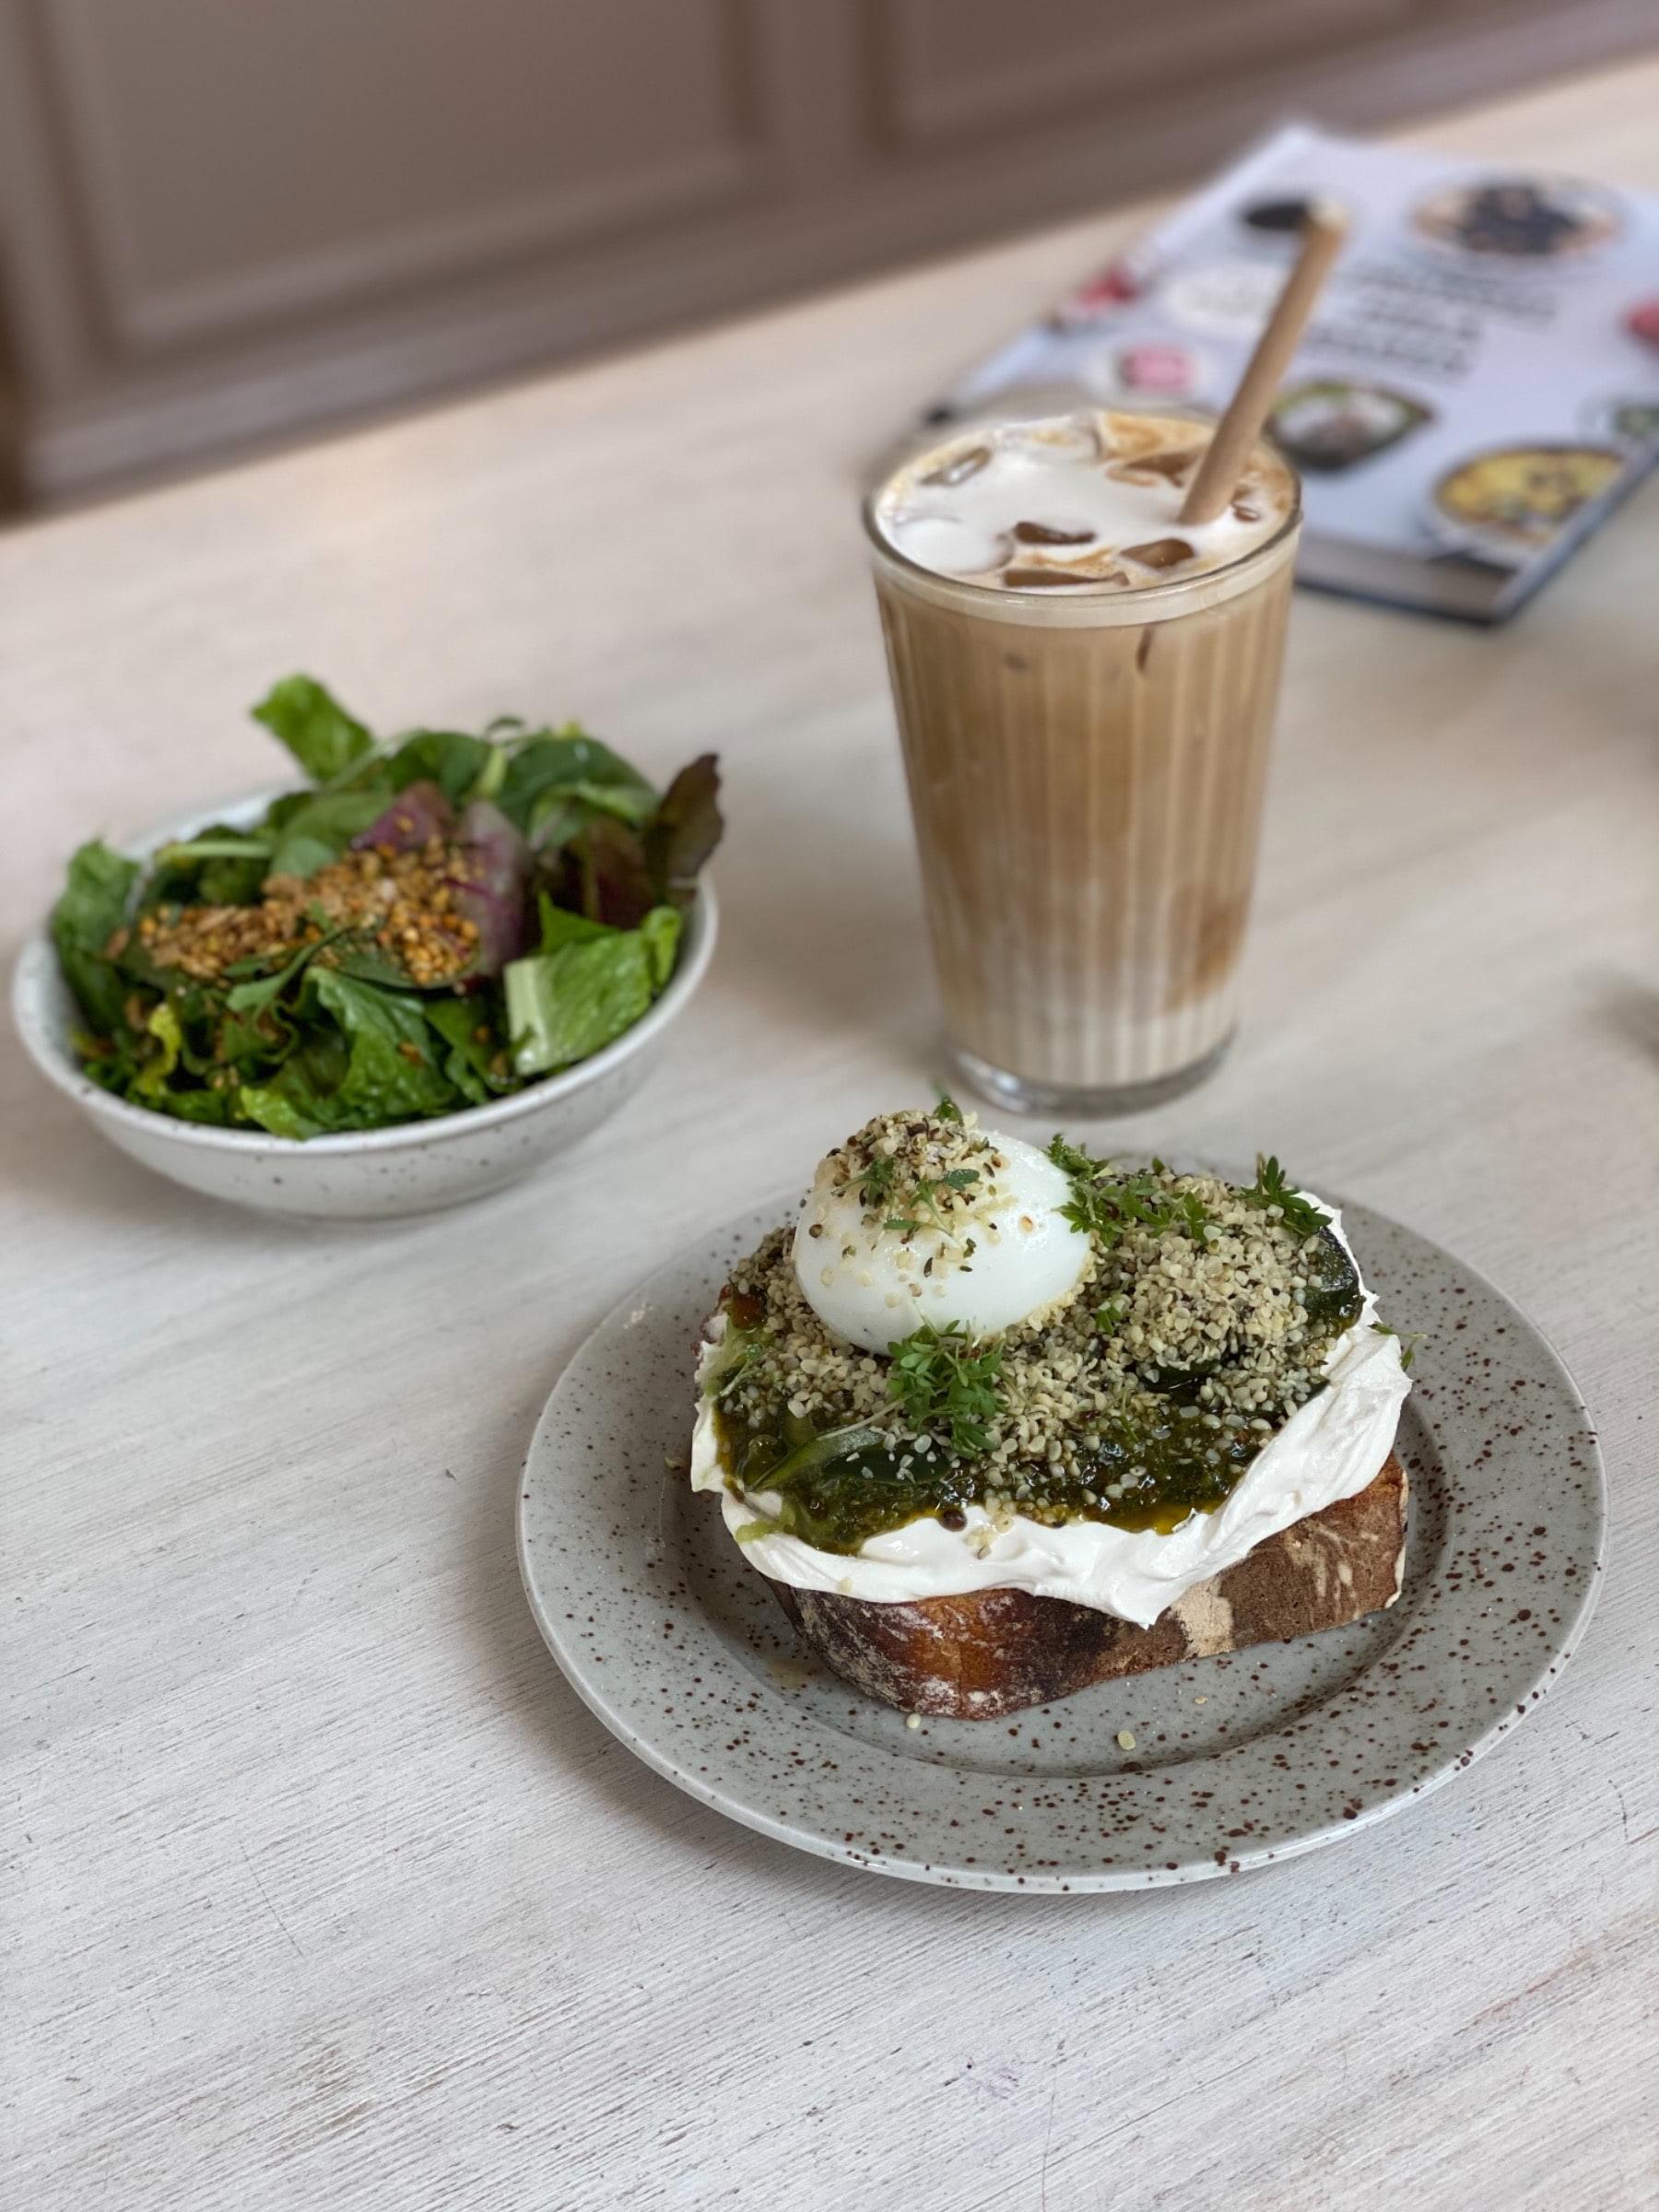 Perflet frukost eller lunch. – Photo from Pom & Flora Bondegatan by Agnes L.